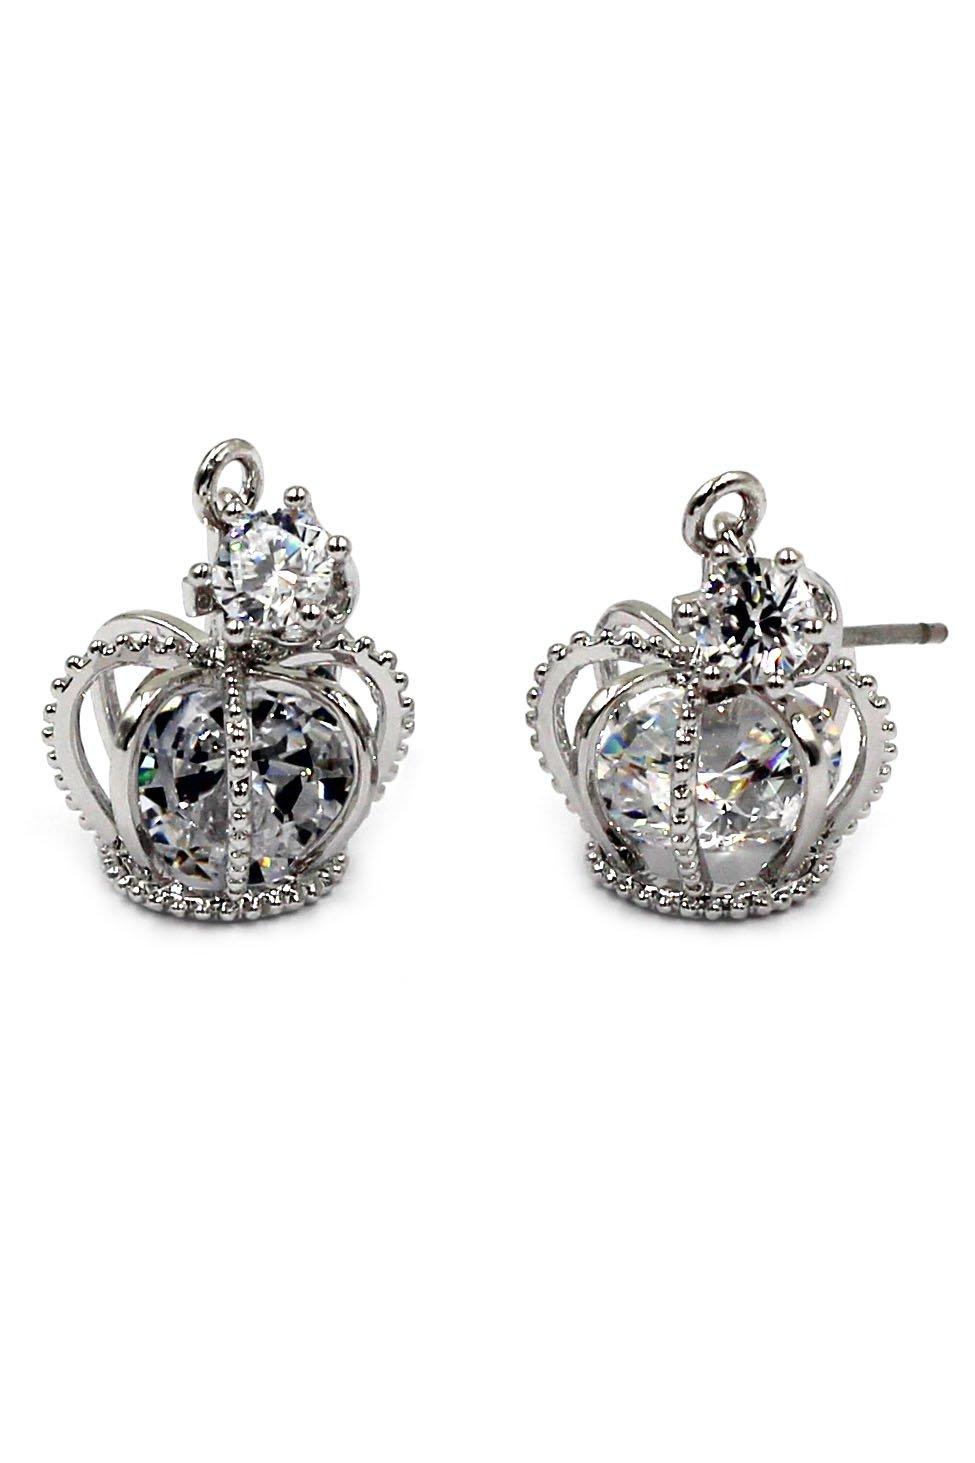 Fashion mini crown crystal silver earrings